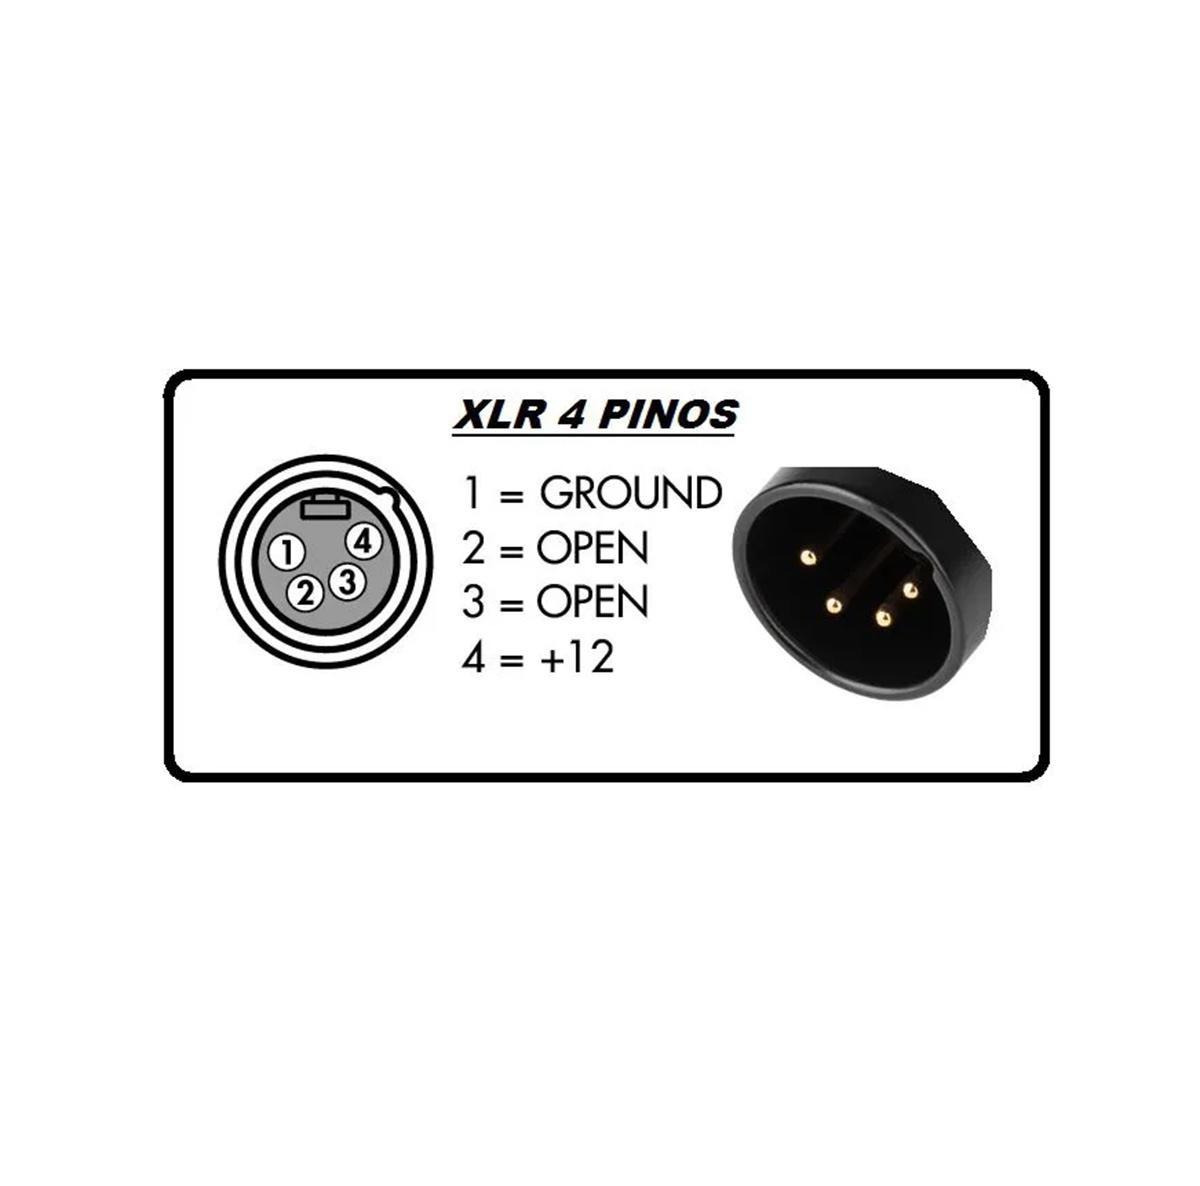 LUMINÁRIA CONECTOR XLR 4 PINOS HOSA TECHNOLOGY LTE-297XLR4